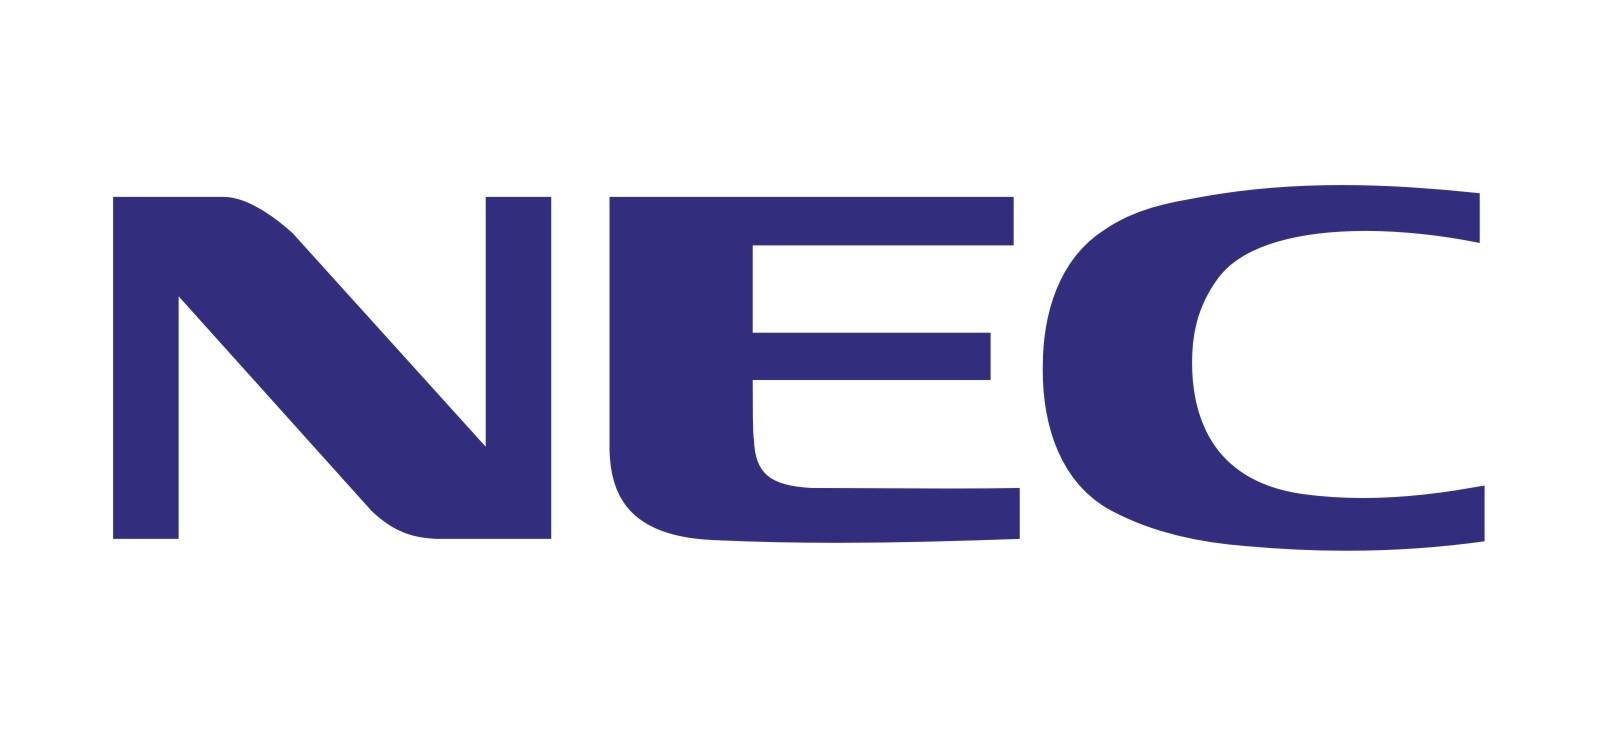 NEC、スマートフォン事業からの撤退を正式に発表